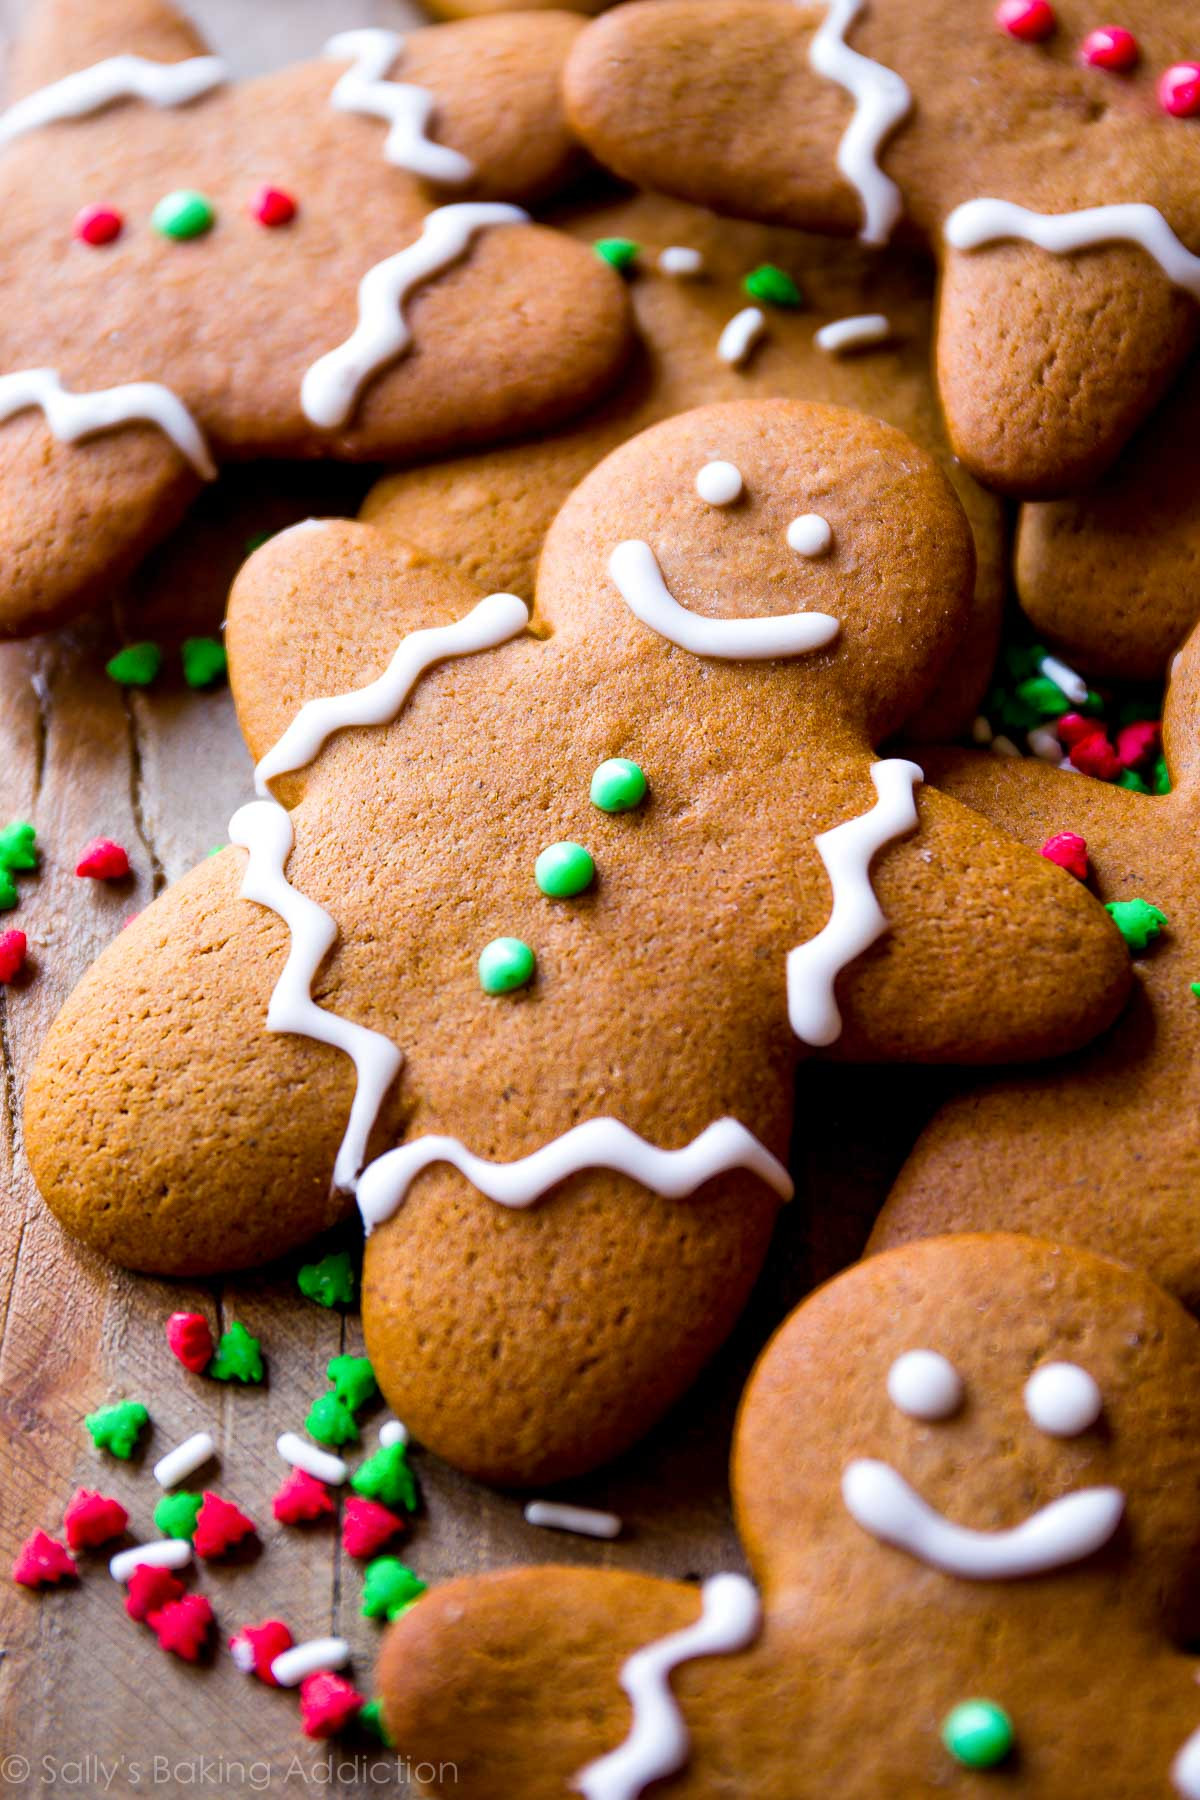 Gingerbread Cookies Recipe  My Favorite Gingerbread Men Recipe Sallys Baking Addiction